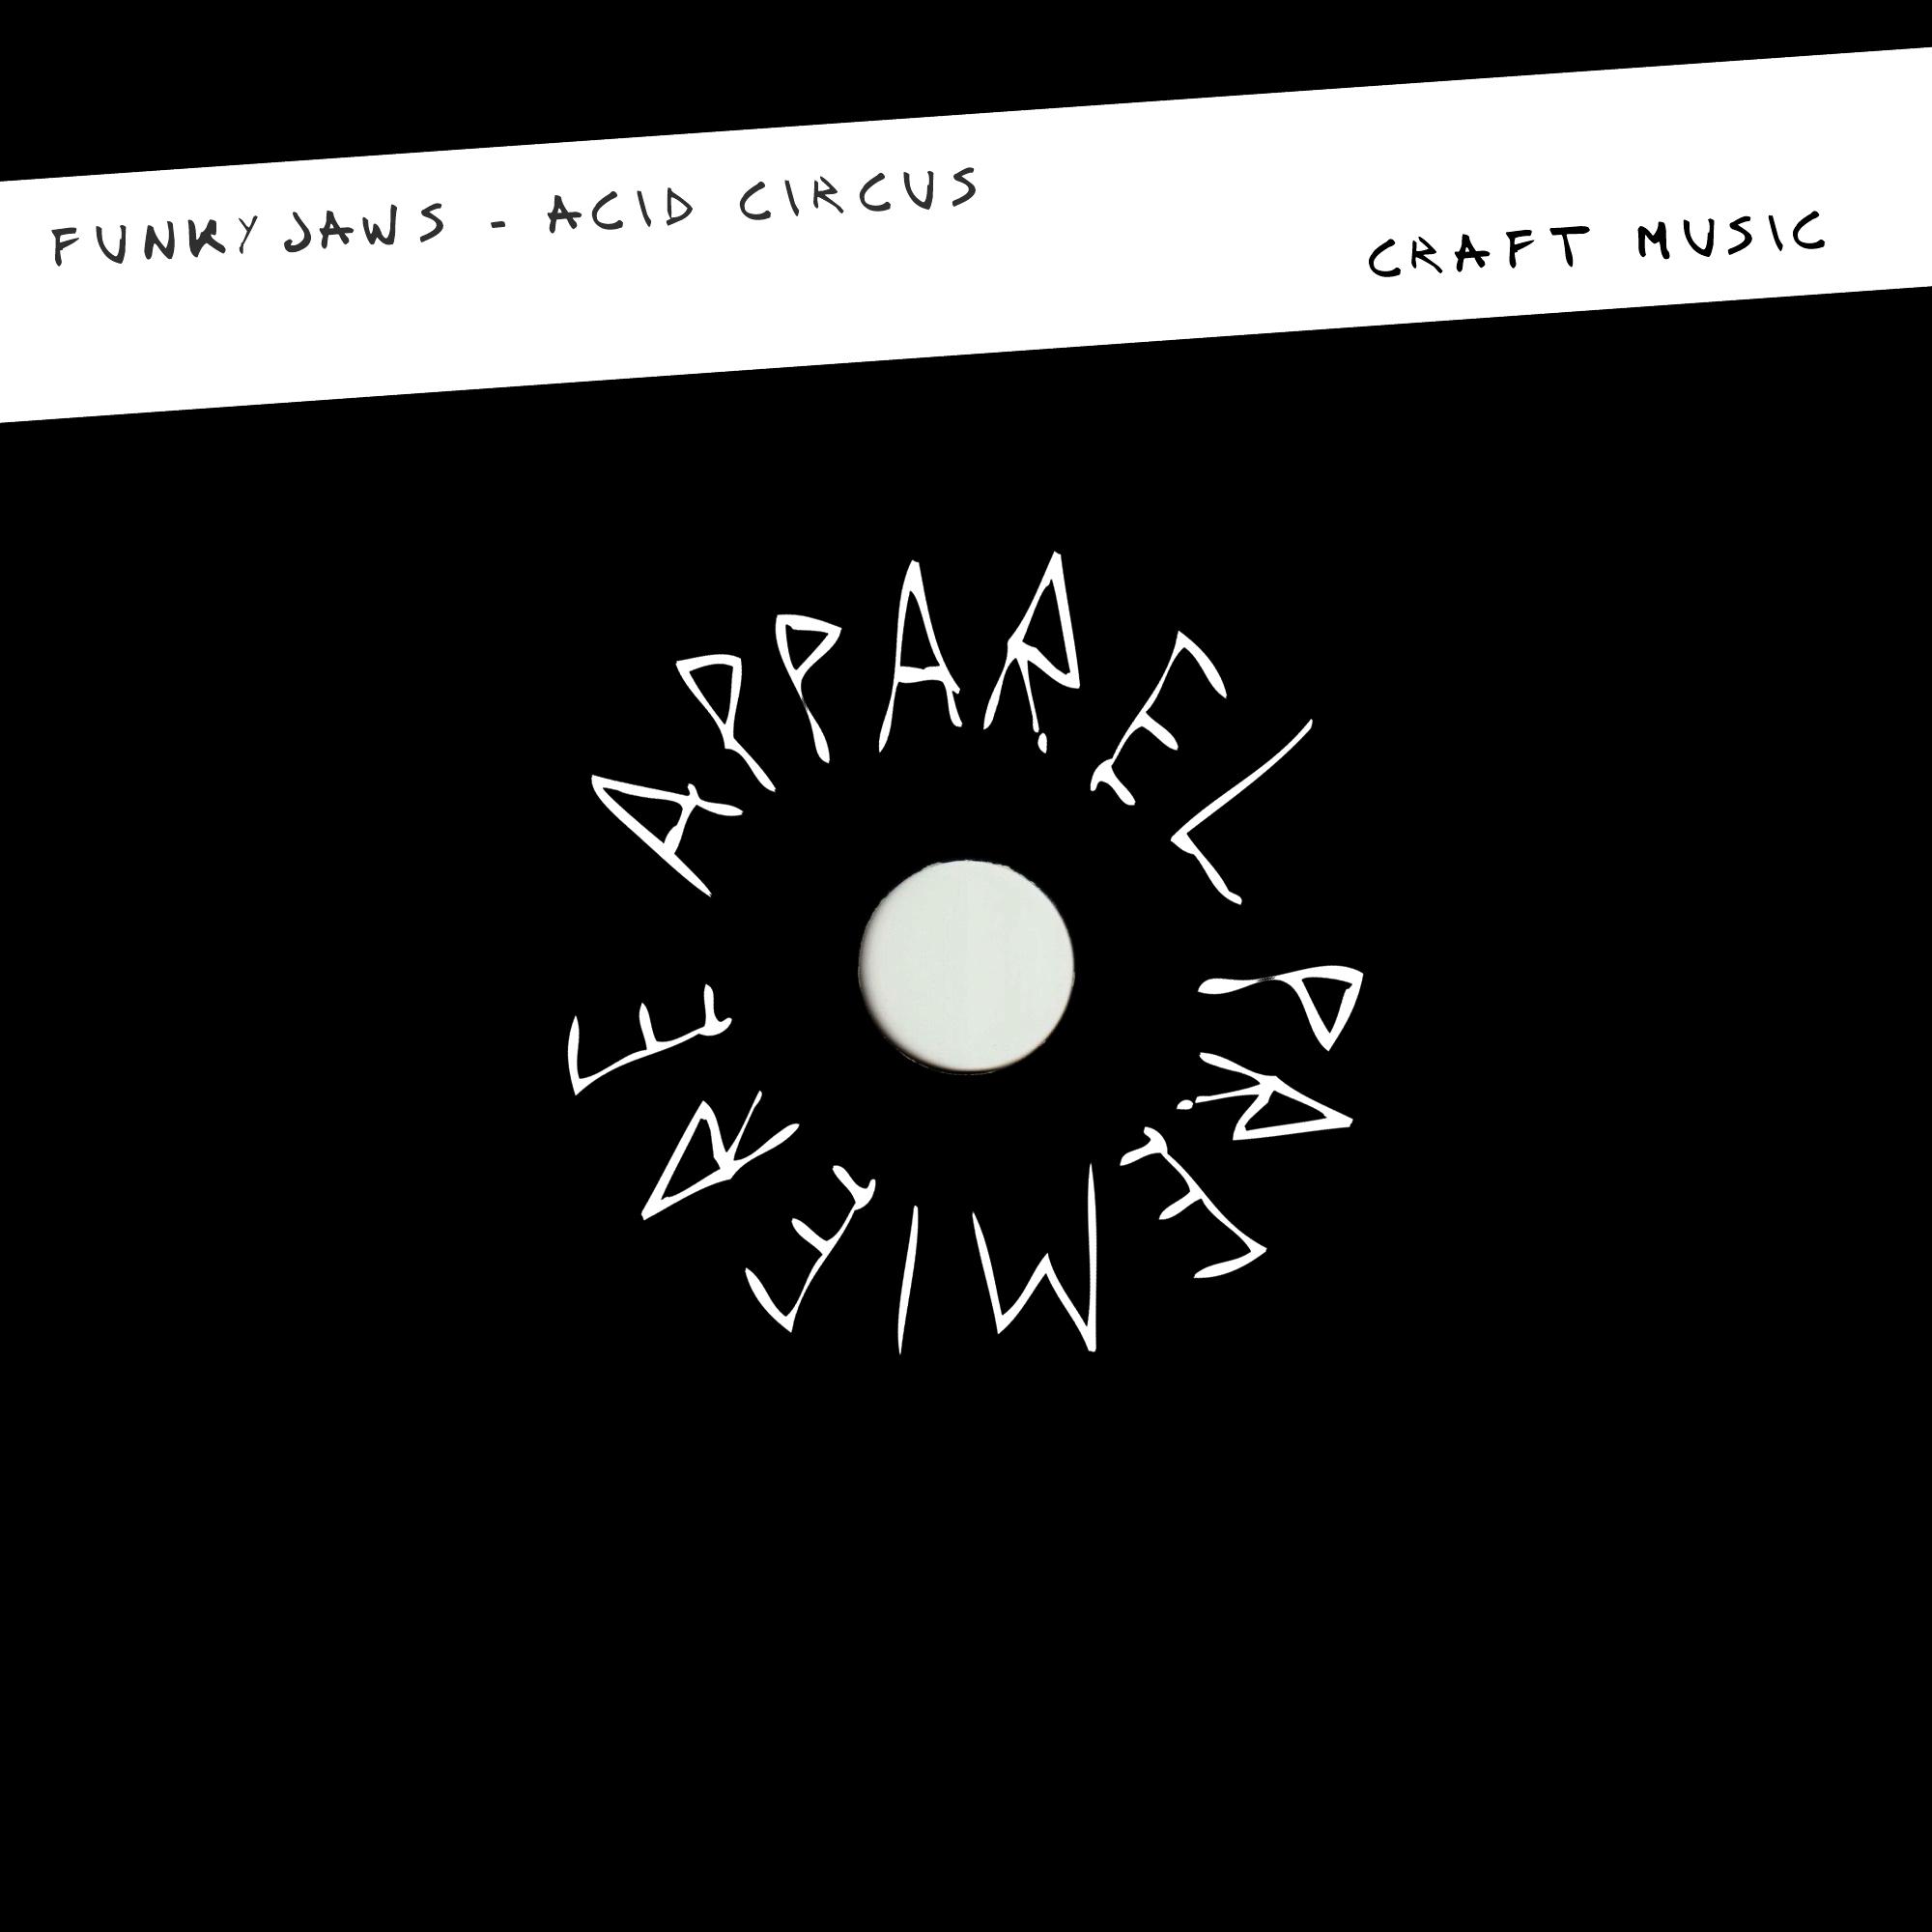 APPAREL PREMIERE Funkyjaws – Acid Circus [Craft Music] Artwork